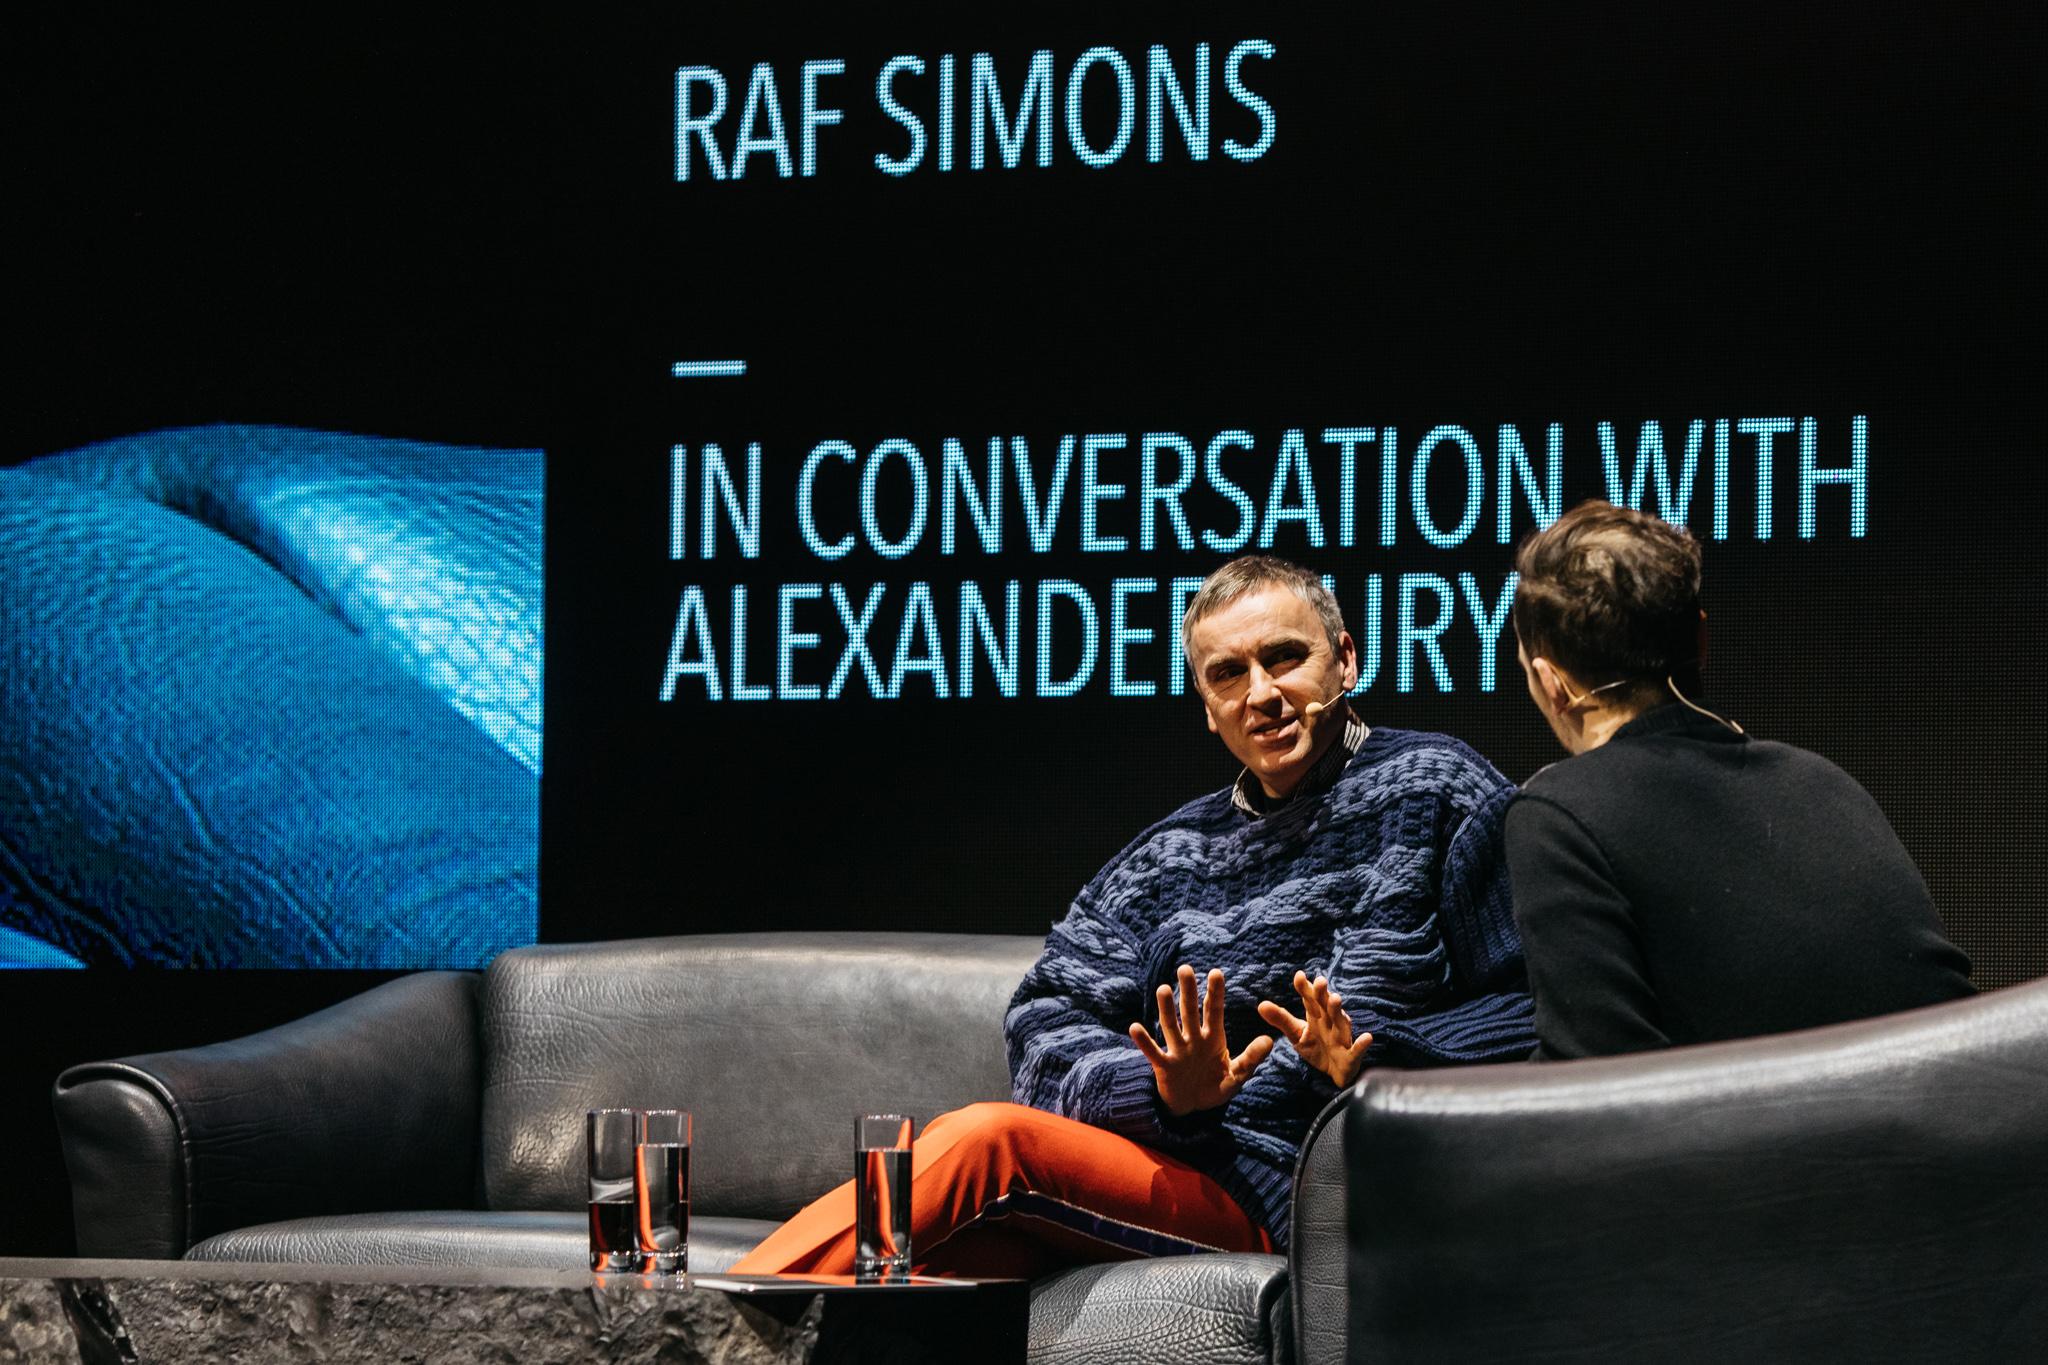 Raf Simons at Fashion Talk